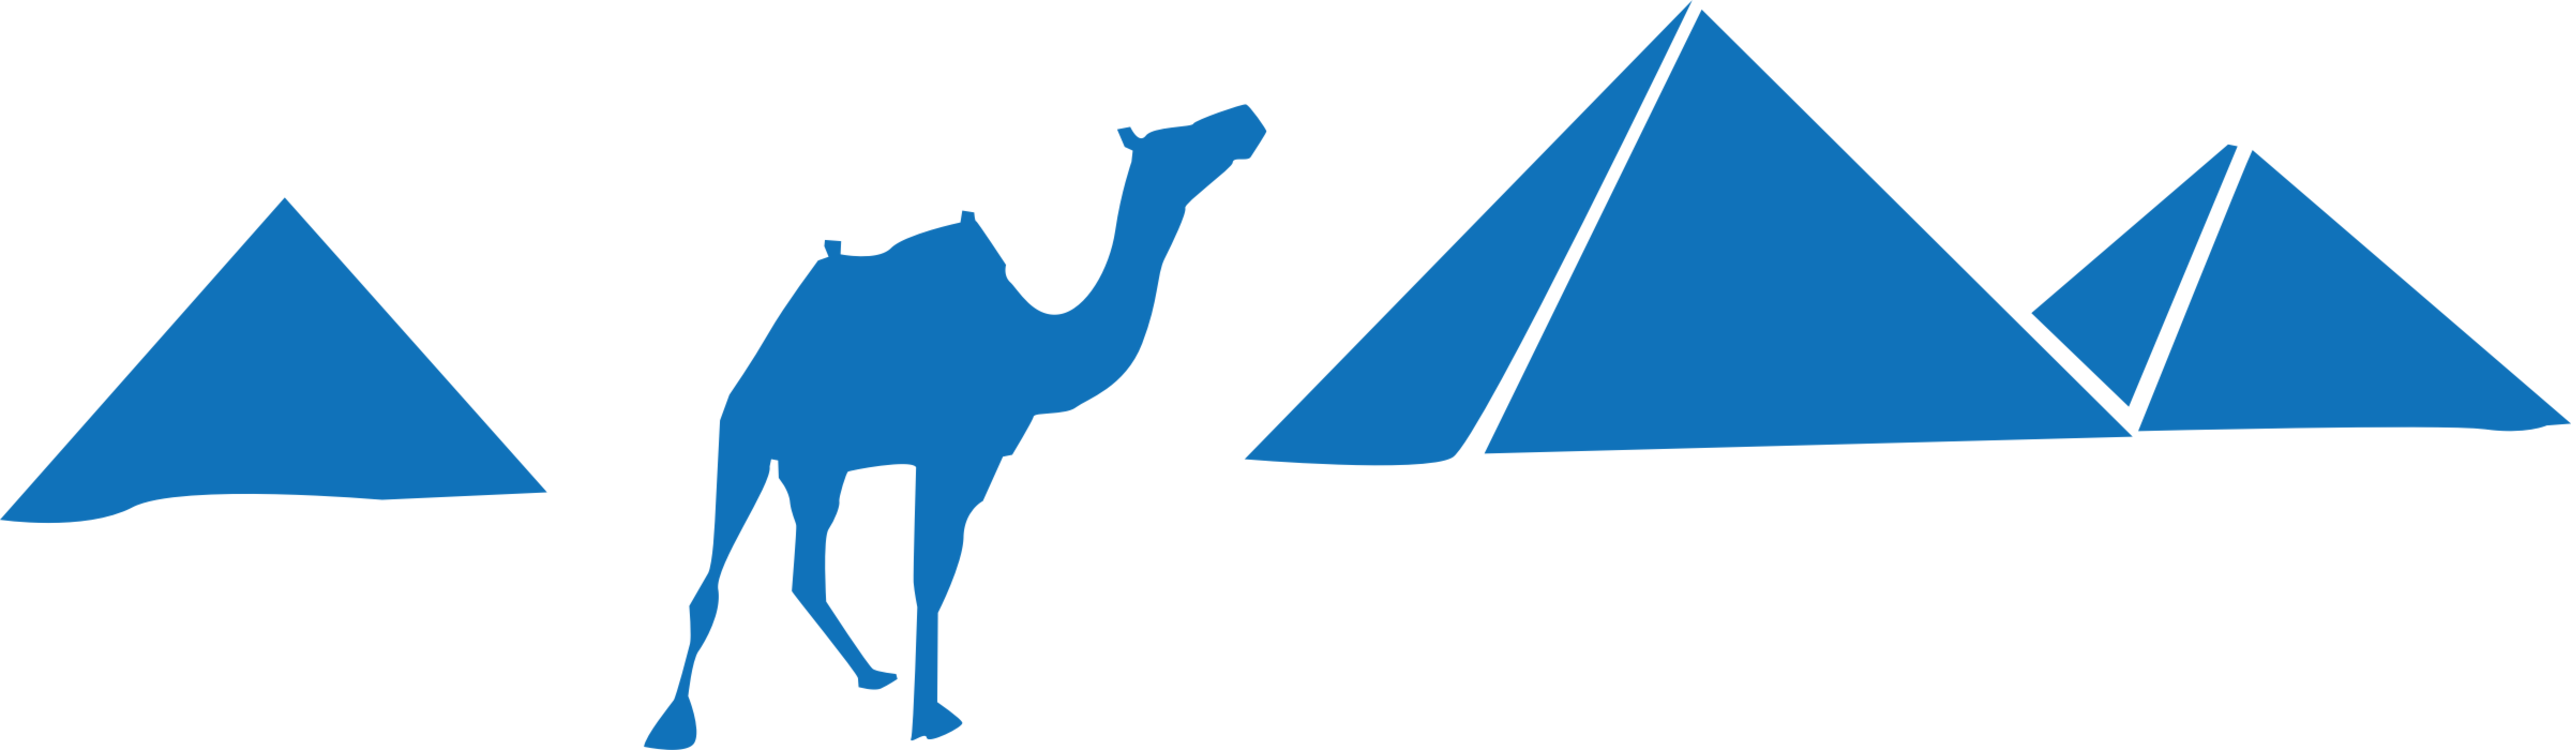 Blue,Silhouette,Triangle